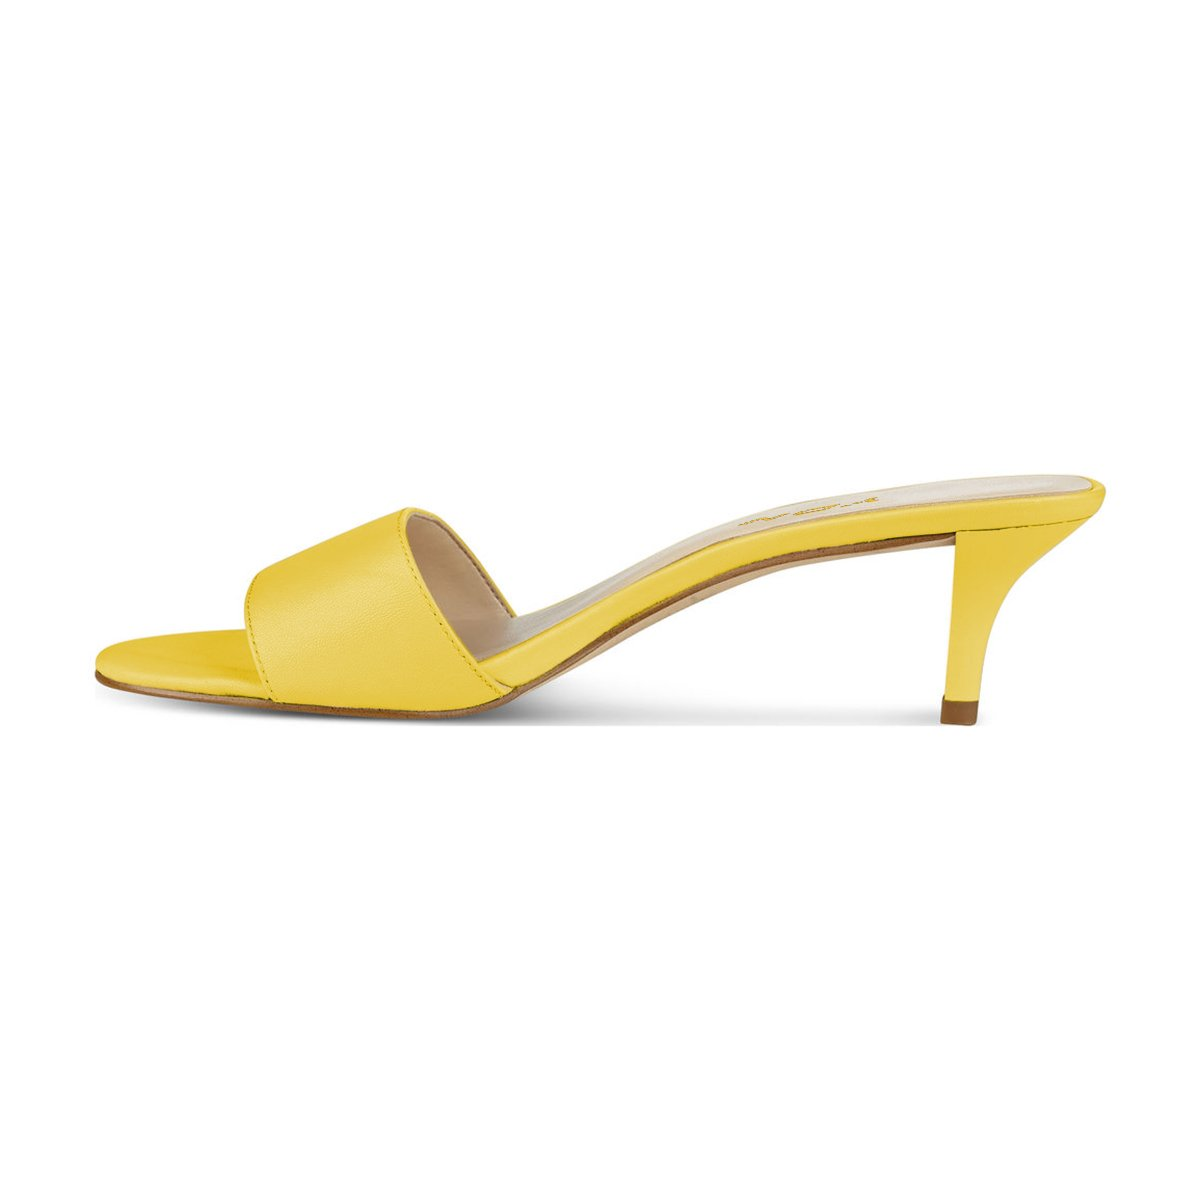 YDN YDN YDN Women Comfy Kitten Low Heel Mules Slip on Clog Sandals Open Toe Dress Pumps Slide Shoes B07BKWLYZN 9 M US|Yellow-5cm 1df17e